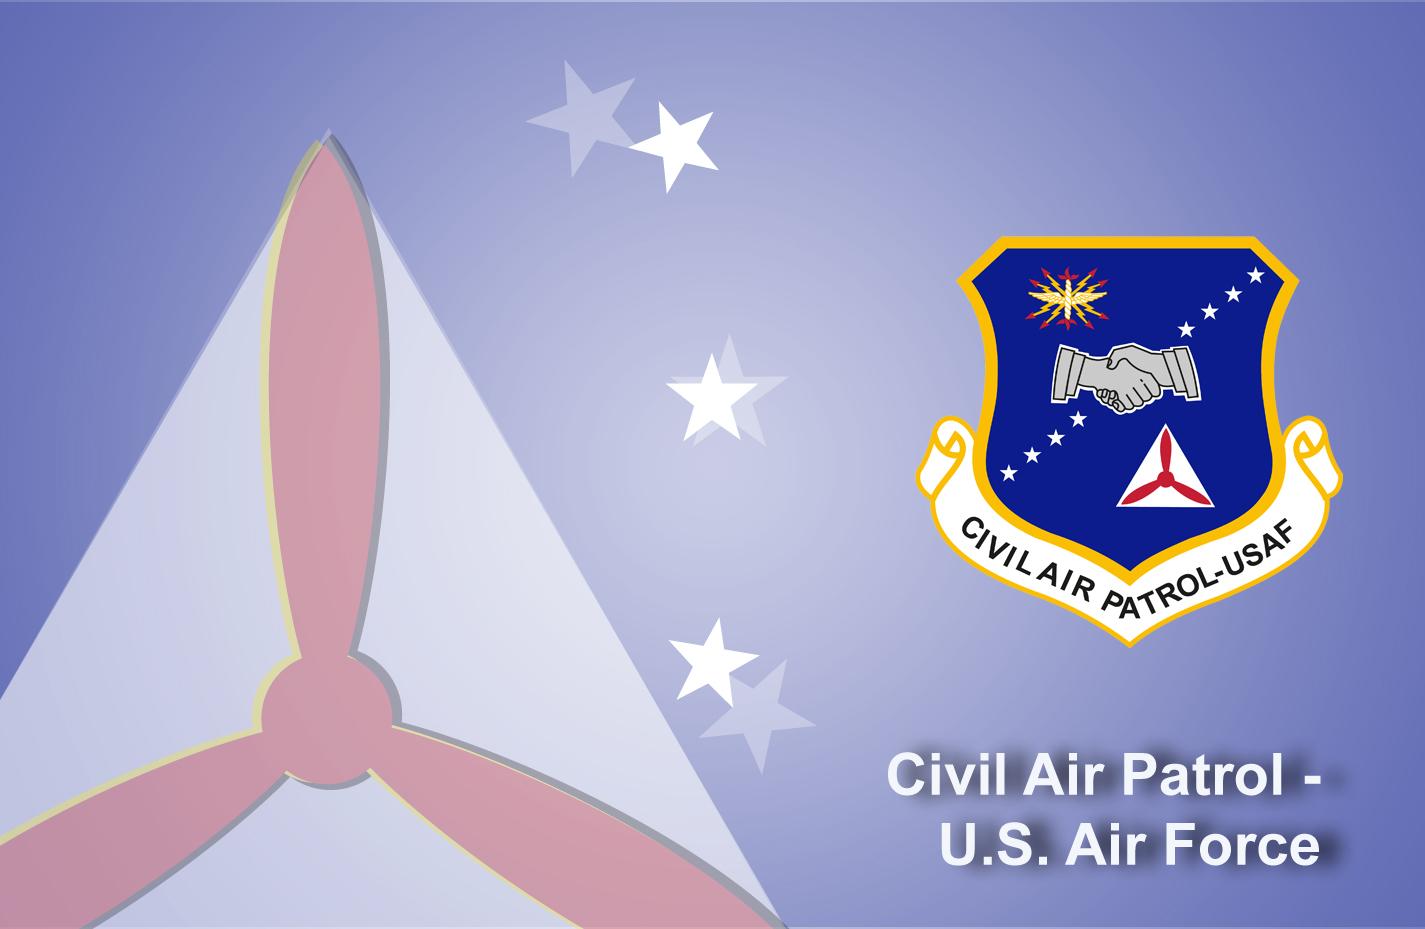 Civil Air Patrol - U.S. Air Force   U.S. Air Force   Fact Sheet Display 041c0a0ad